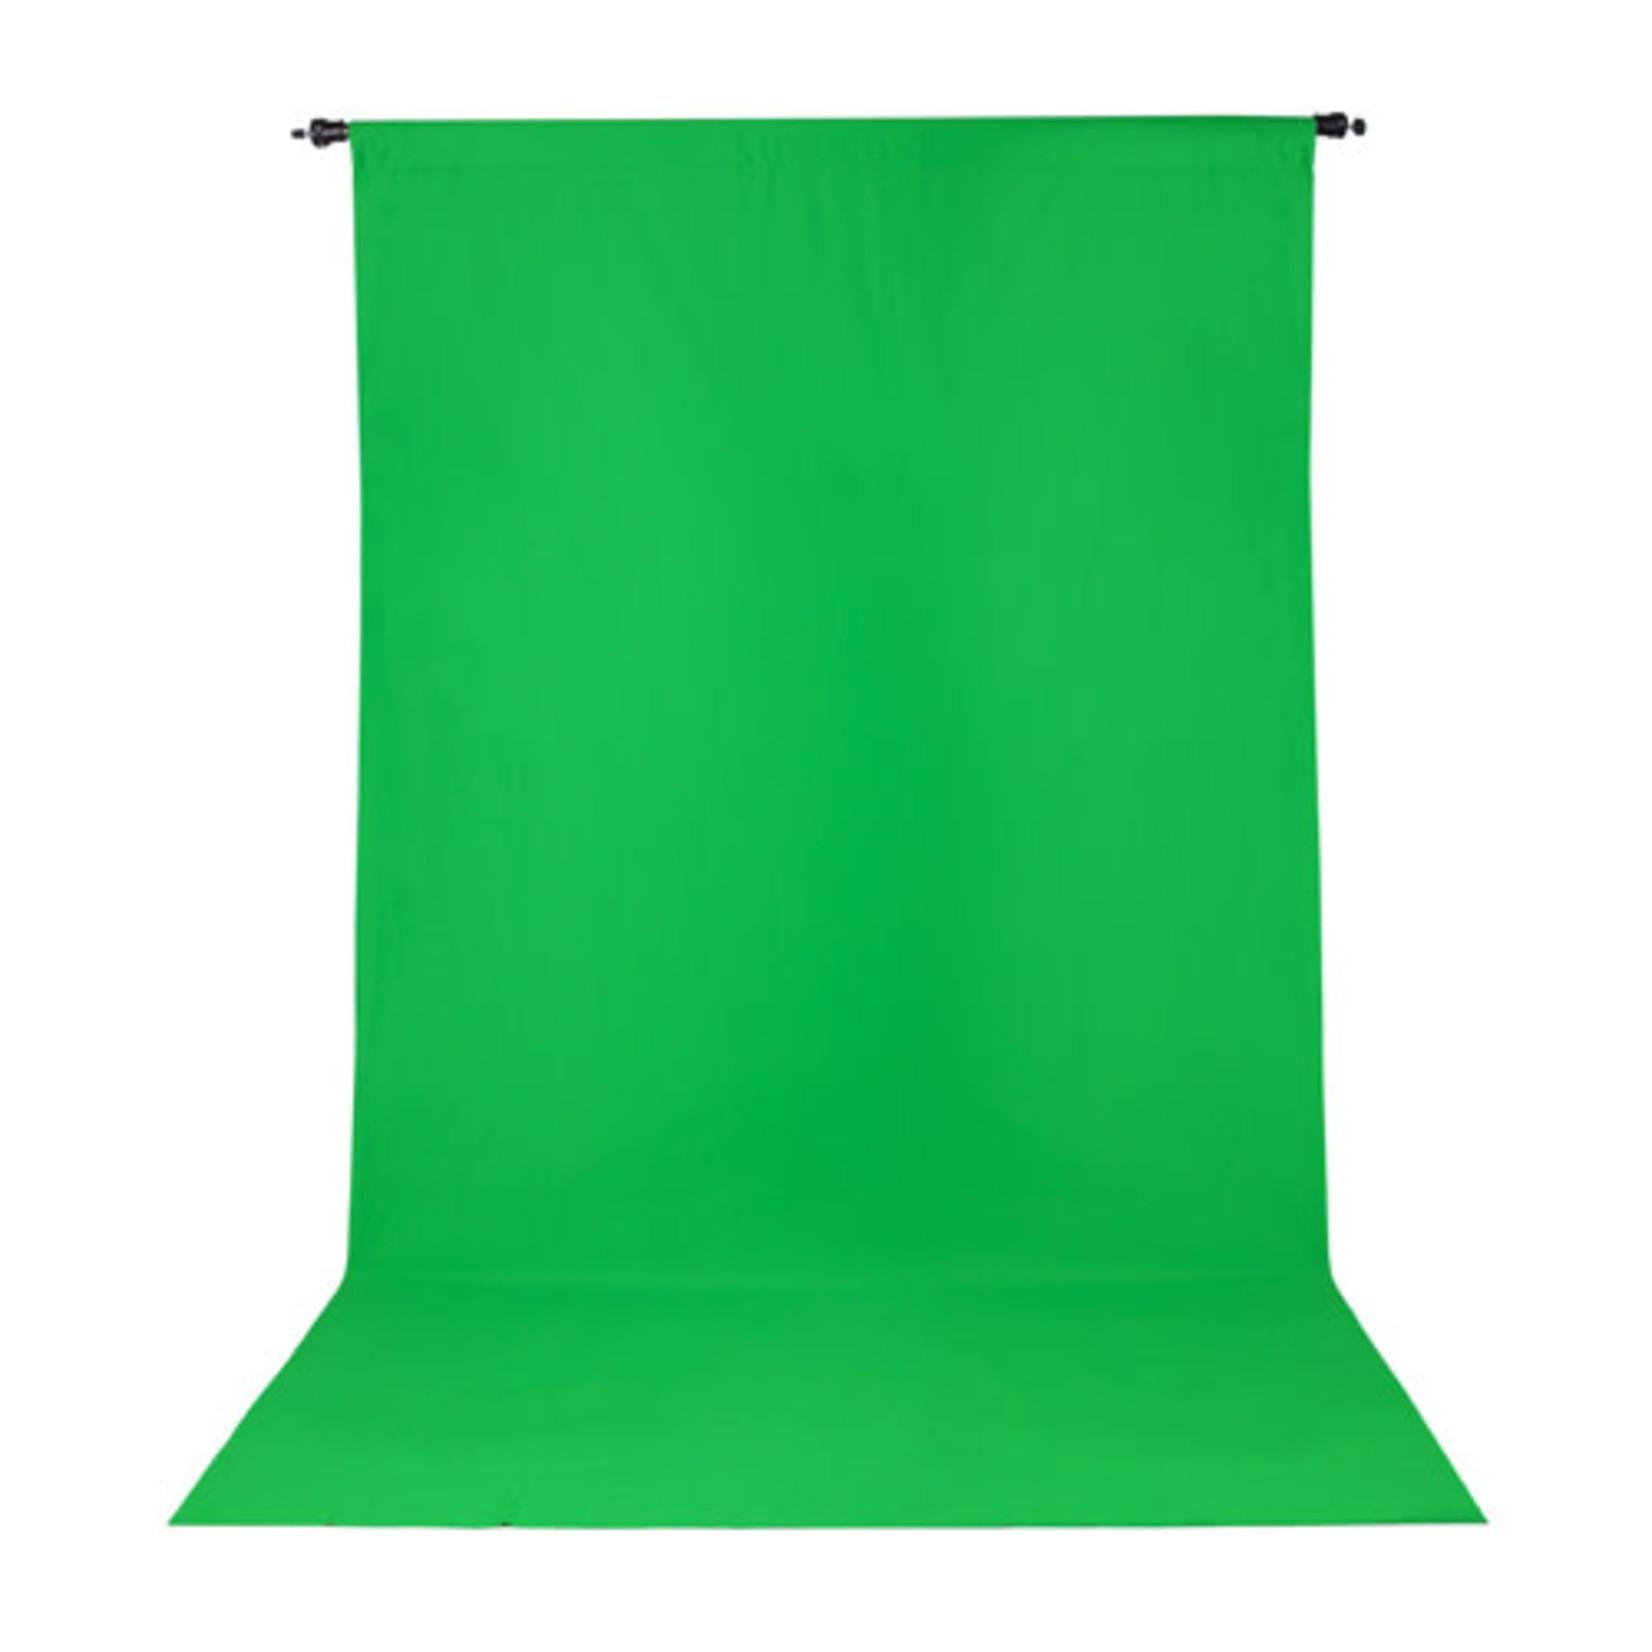 ProMaster Wrinkle Resistant Backdrop 5'x9' - Chroma-key Green